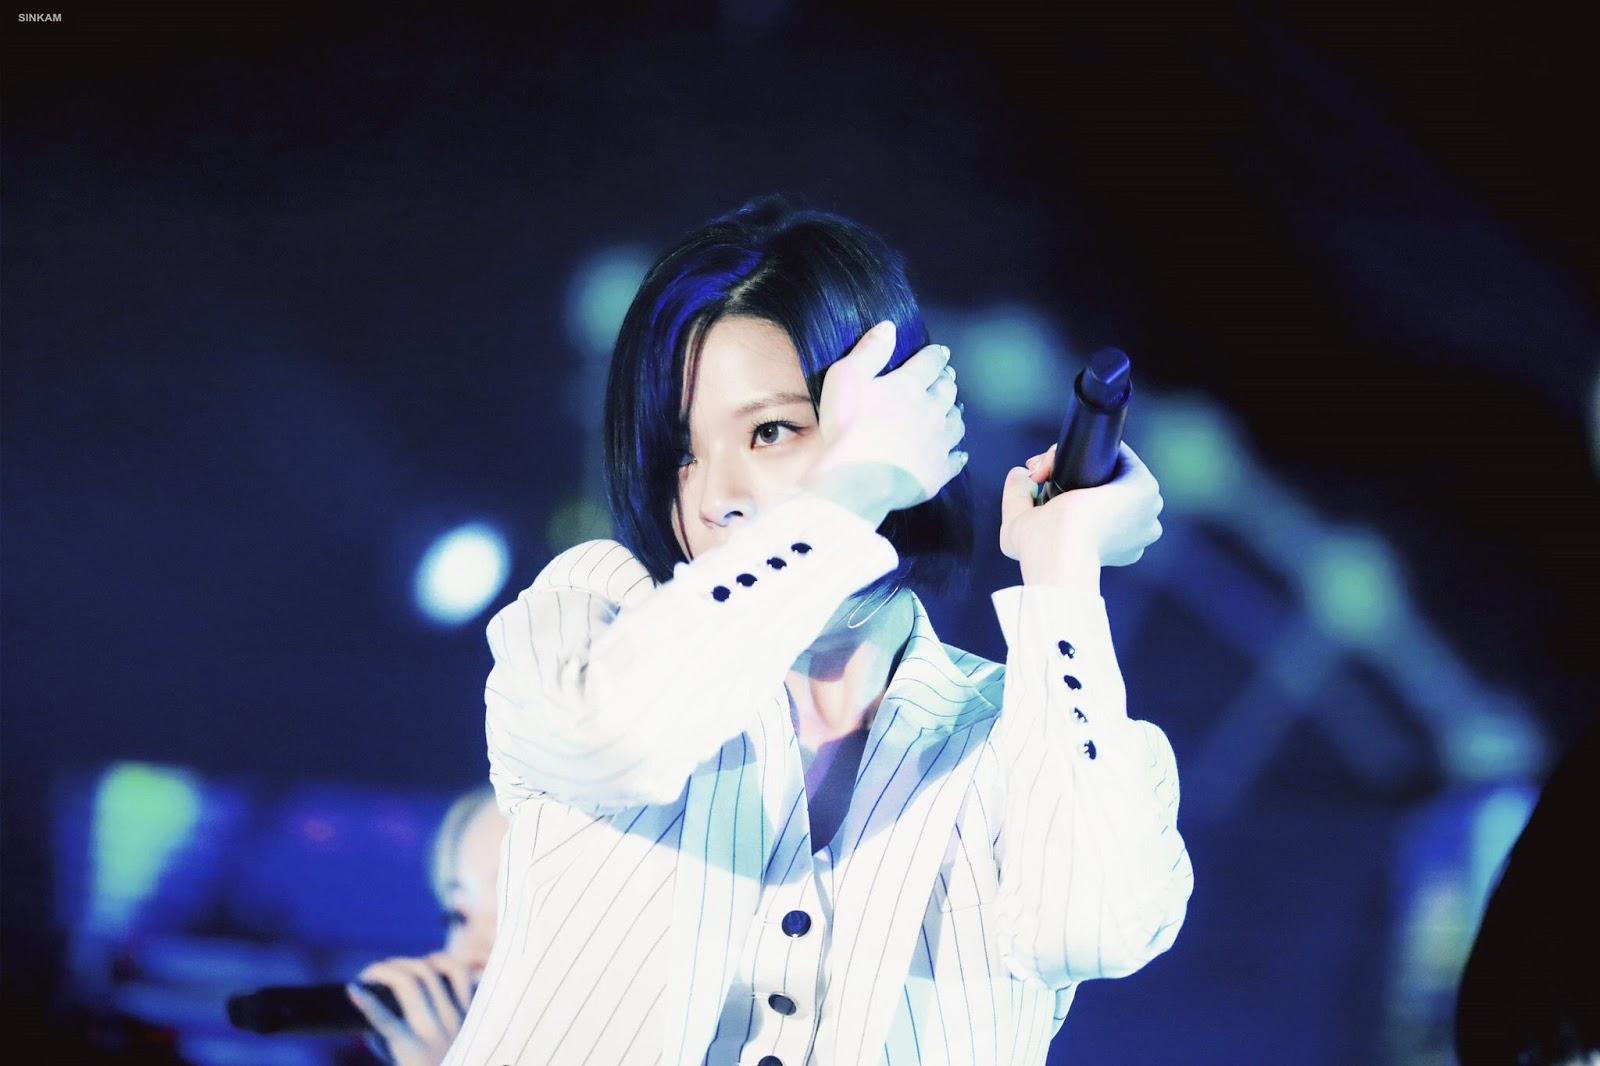 jeongyeon_lotte family concert_3